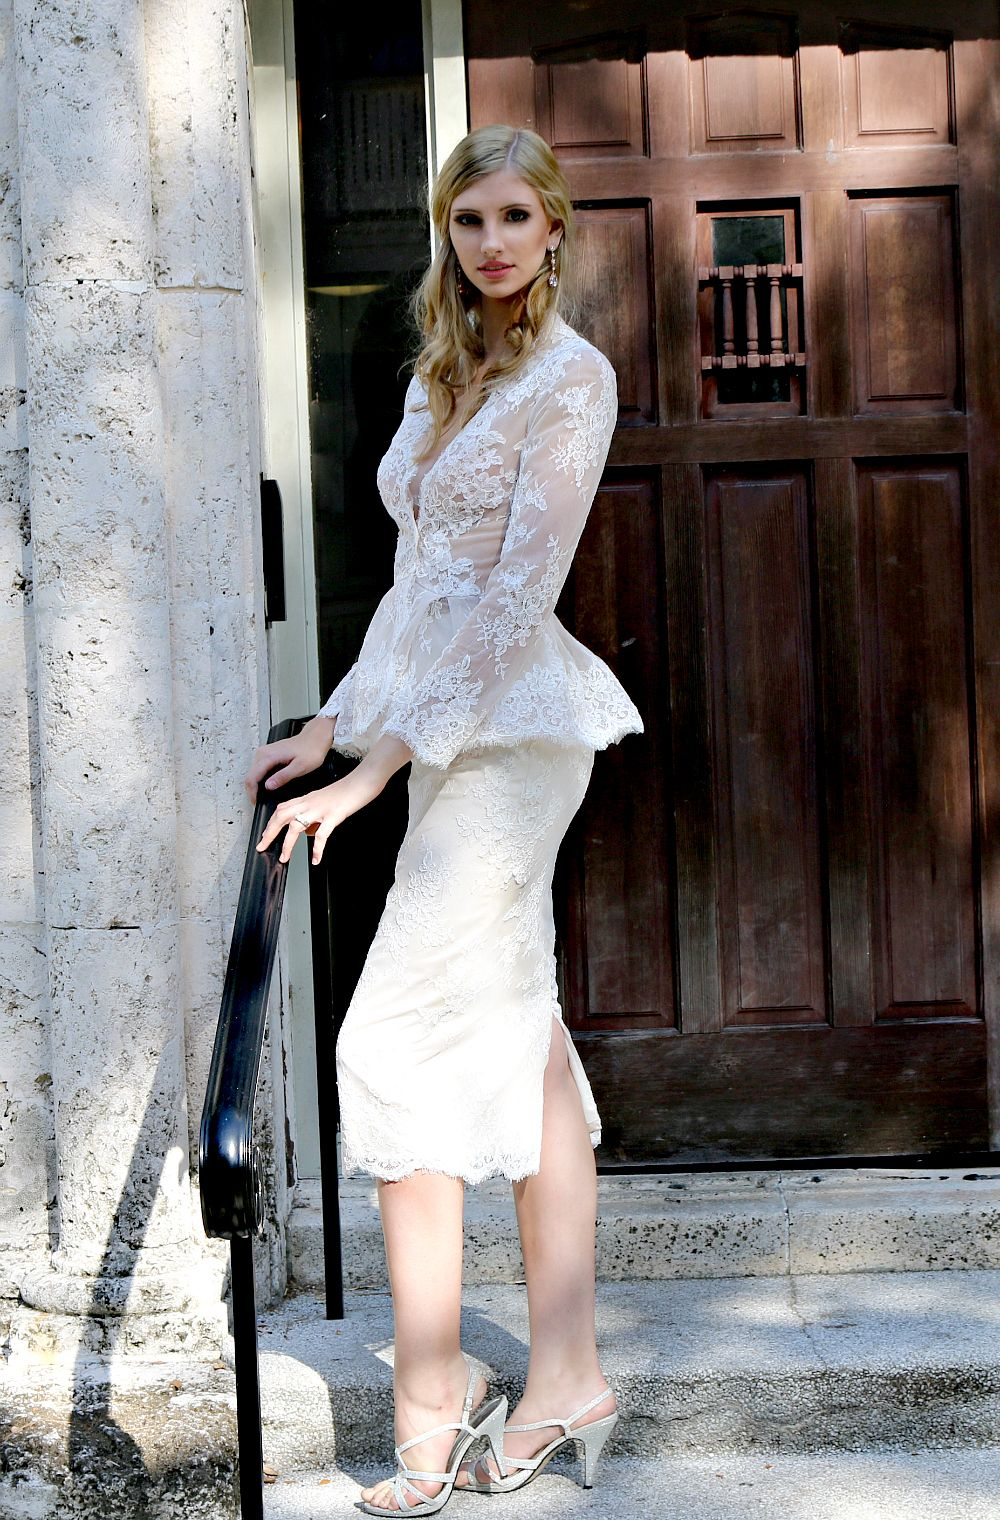 Stunning Bridal Separates Vintage Lace Long Sleeved Wedding Sheer Jacket Paired With Mid Calf Pe Wedding Dresses Unique Wedding Dress Sets Short Wedding Dress [ 1520 x 1000 Pixel ]